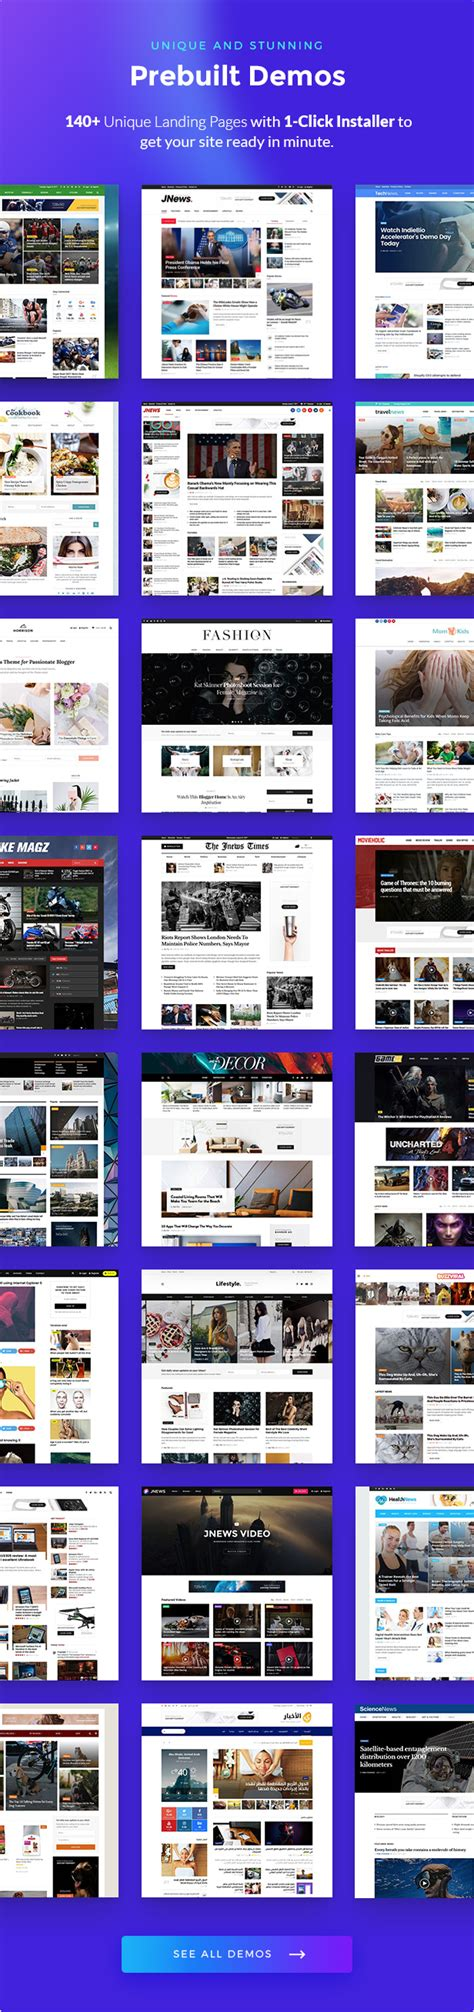 jnews  professional wordpress news theme  quickstart